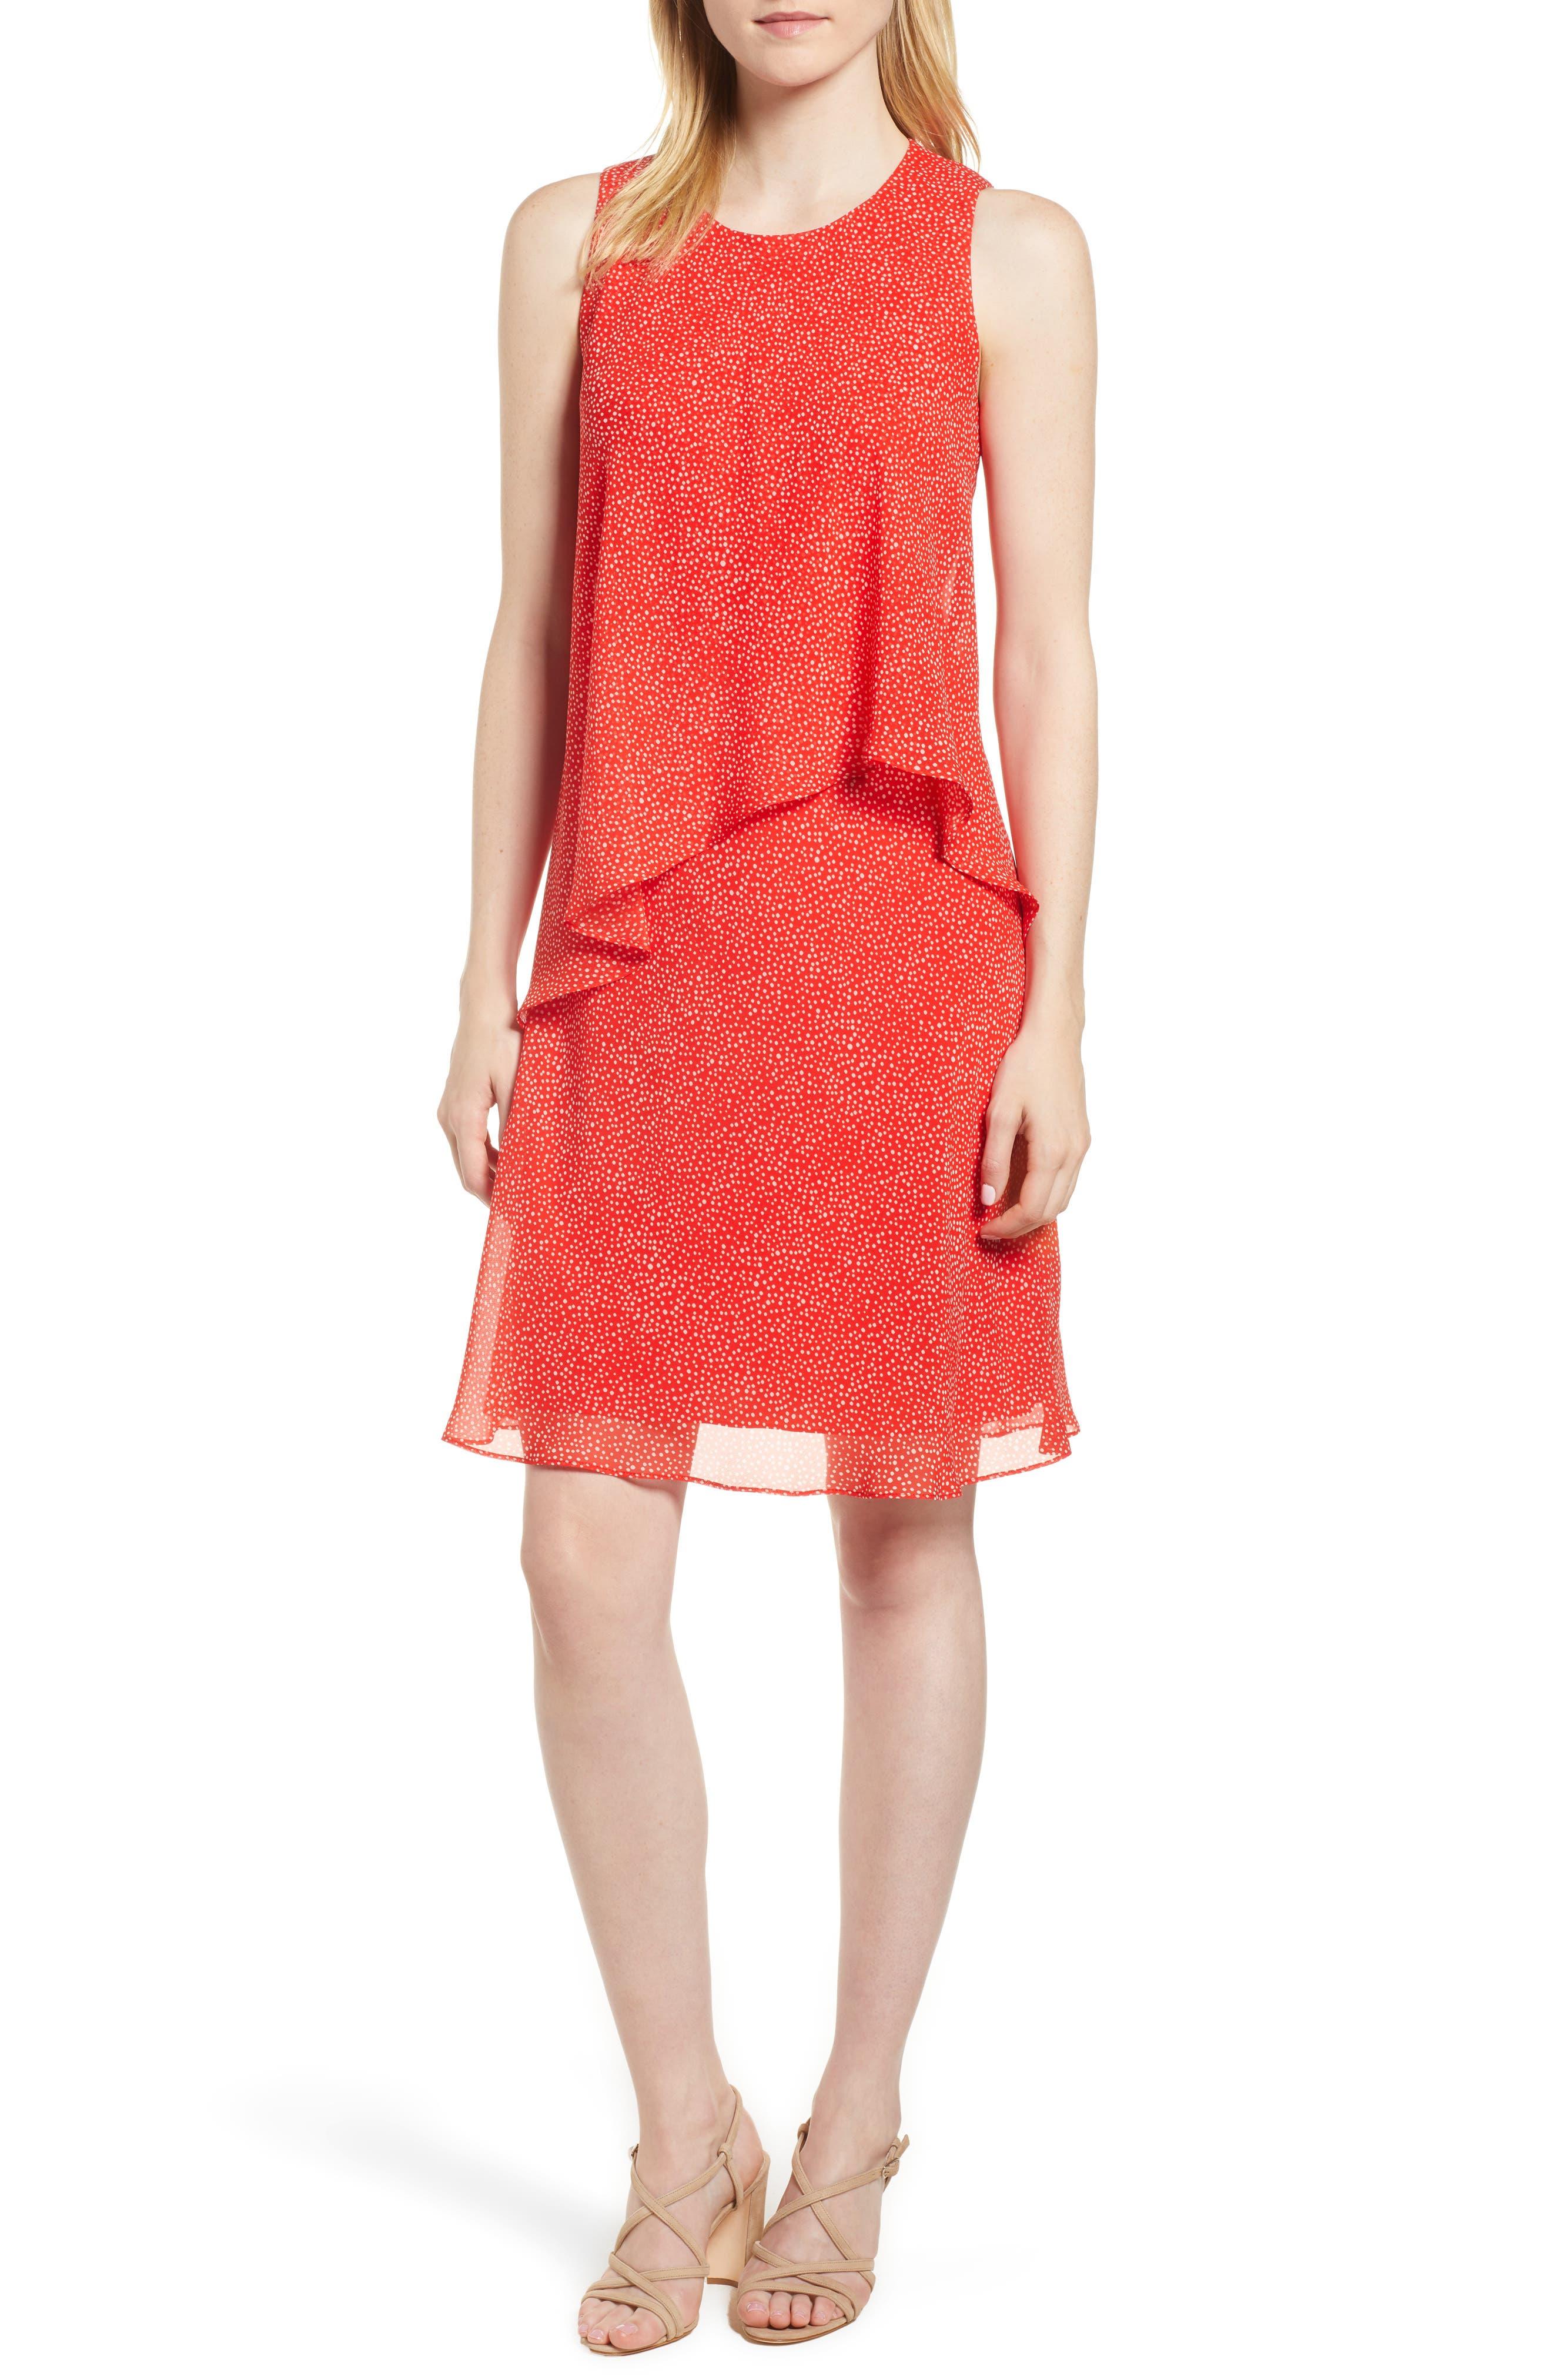 Chiffon Overlay A-Line Dress,                             Main thumbnail 1, color,                             Tomato/ White